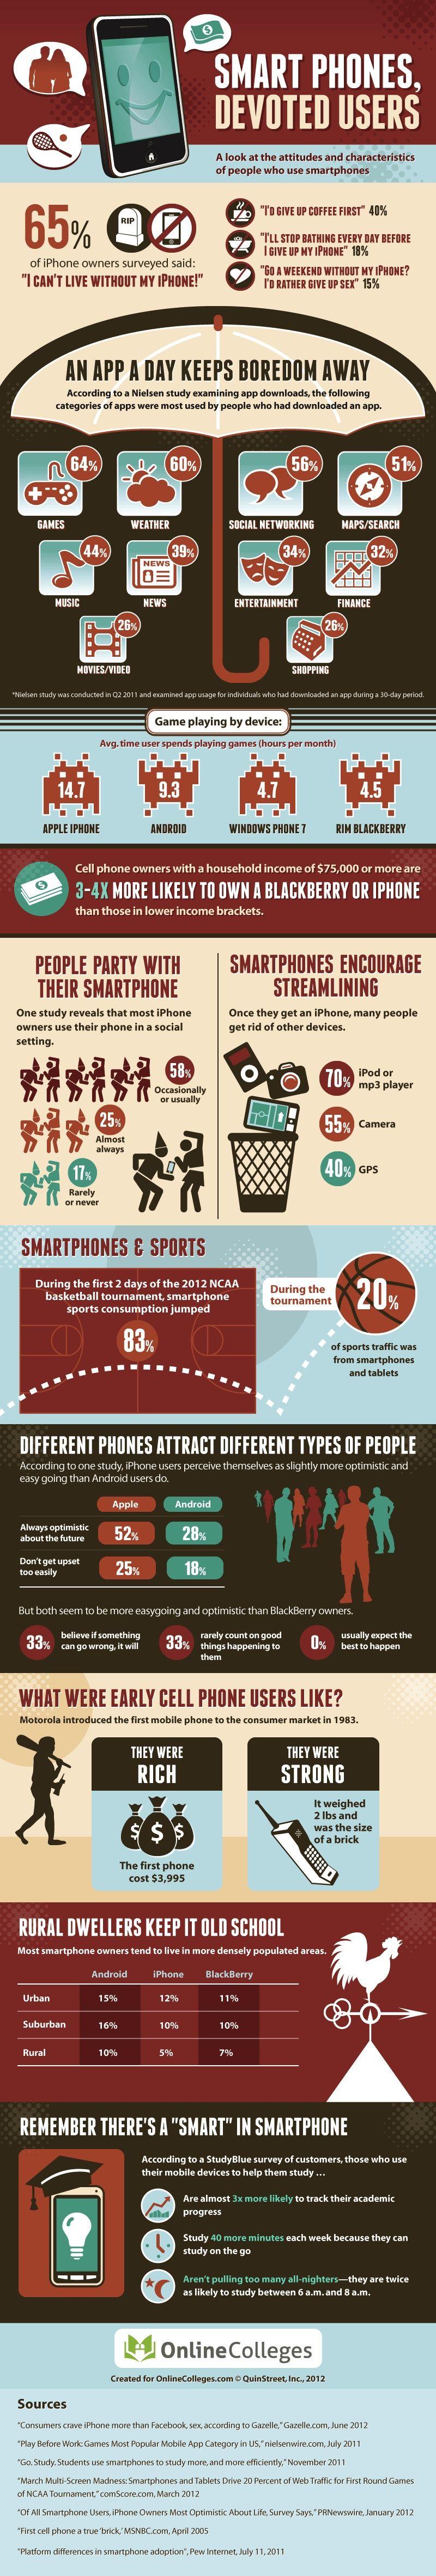 http://5.mshcdn.com/wp-content/uploads/2012/09/smartphone-devoted-users-infographic.jpg